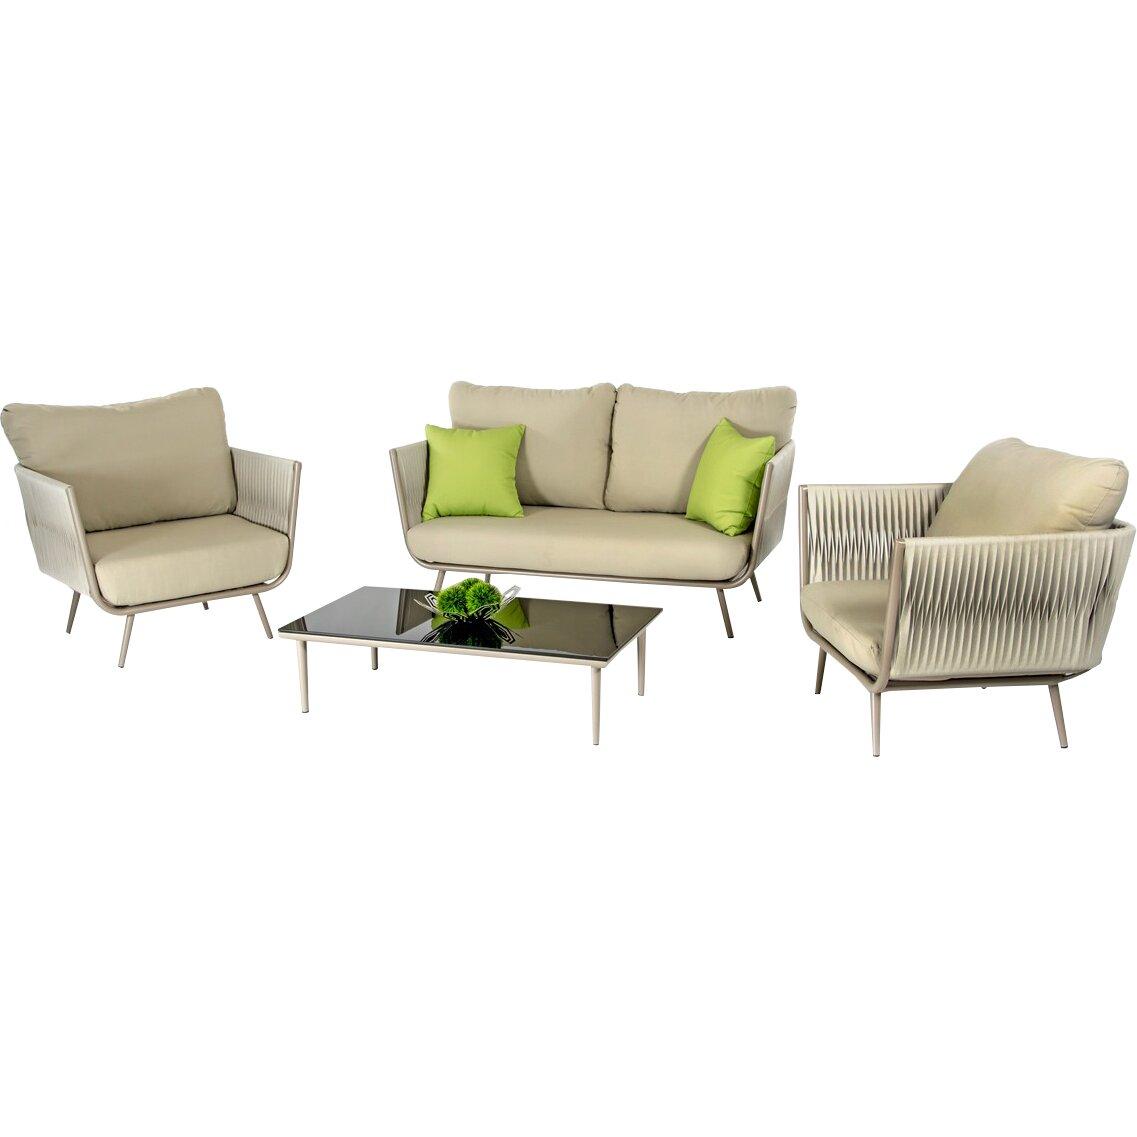 Vig furniture renava zoe outdoor 9 piece lounge seating for Outdoor furniture 9 piece